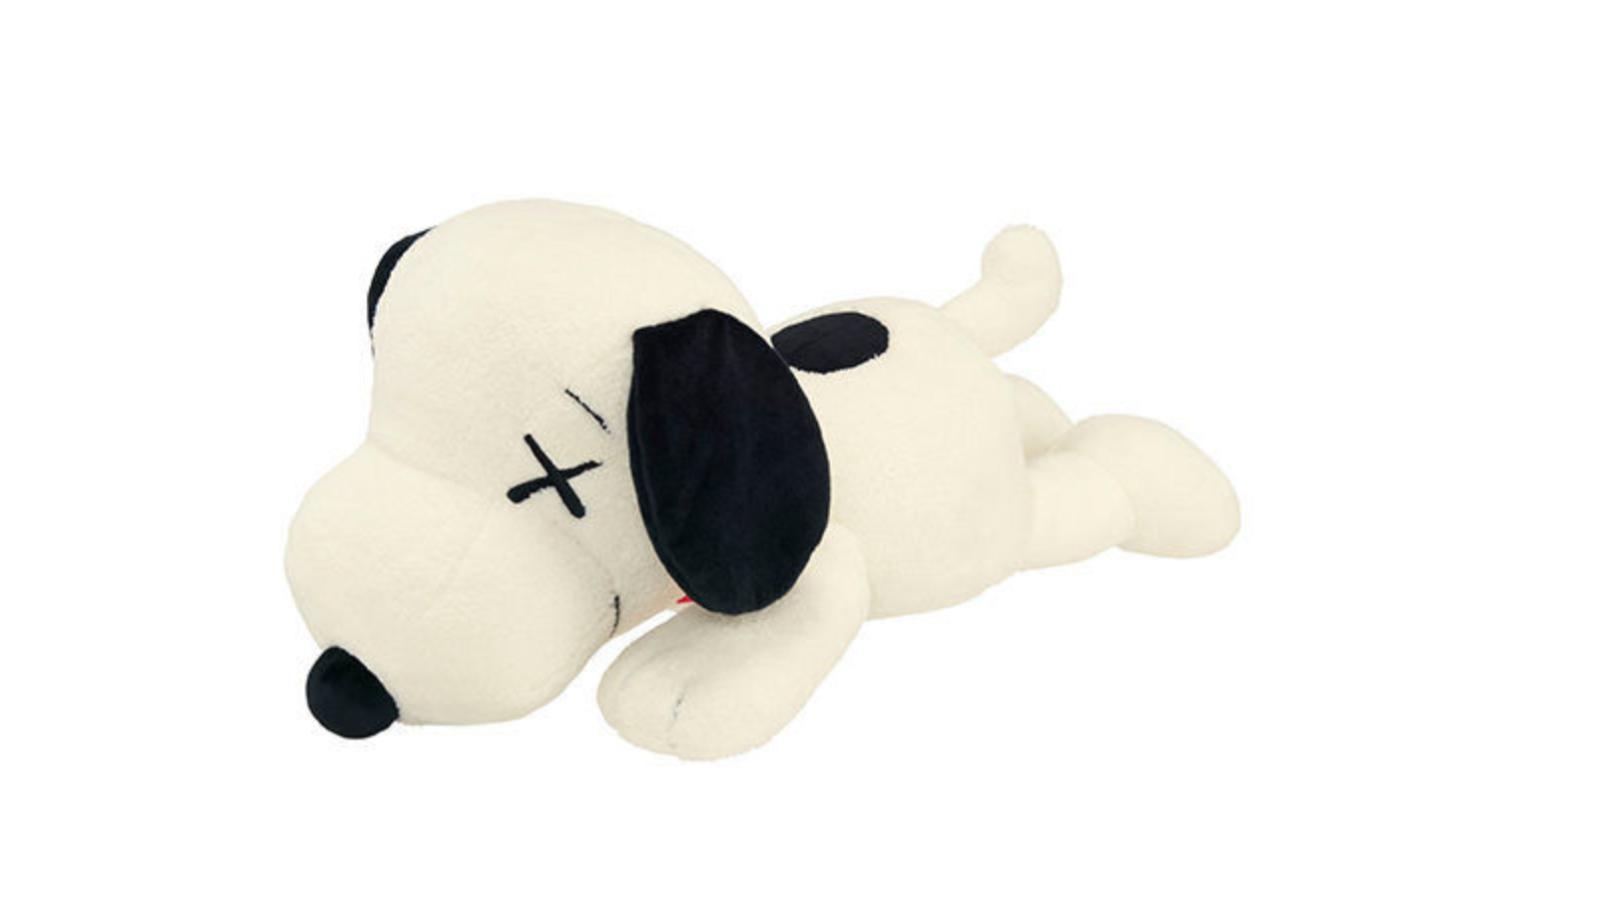 Kaws x Uniqlo x Peanuts Snoopy Plush (Large) White